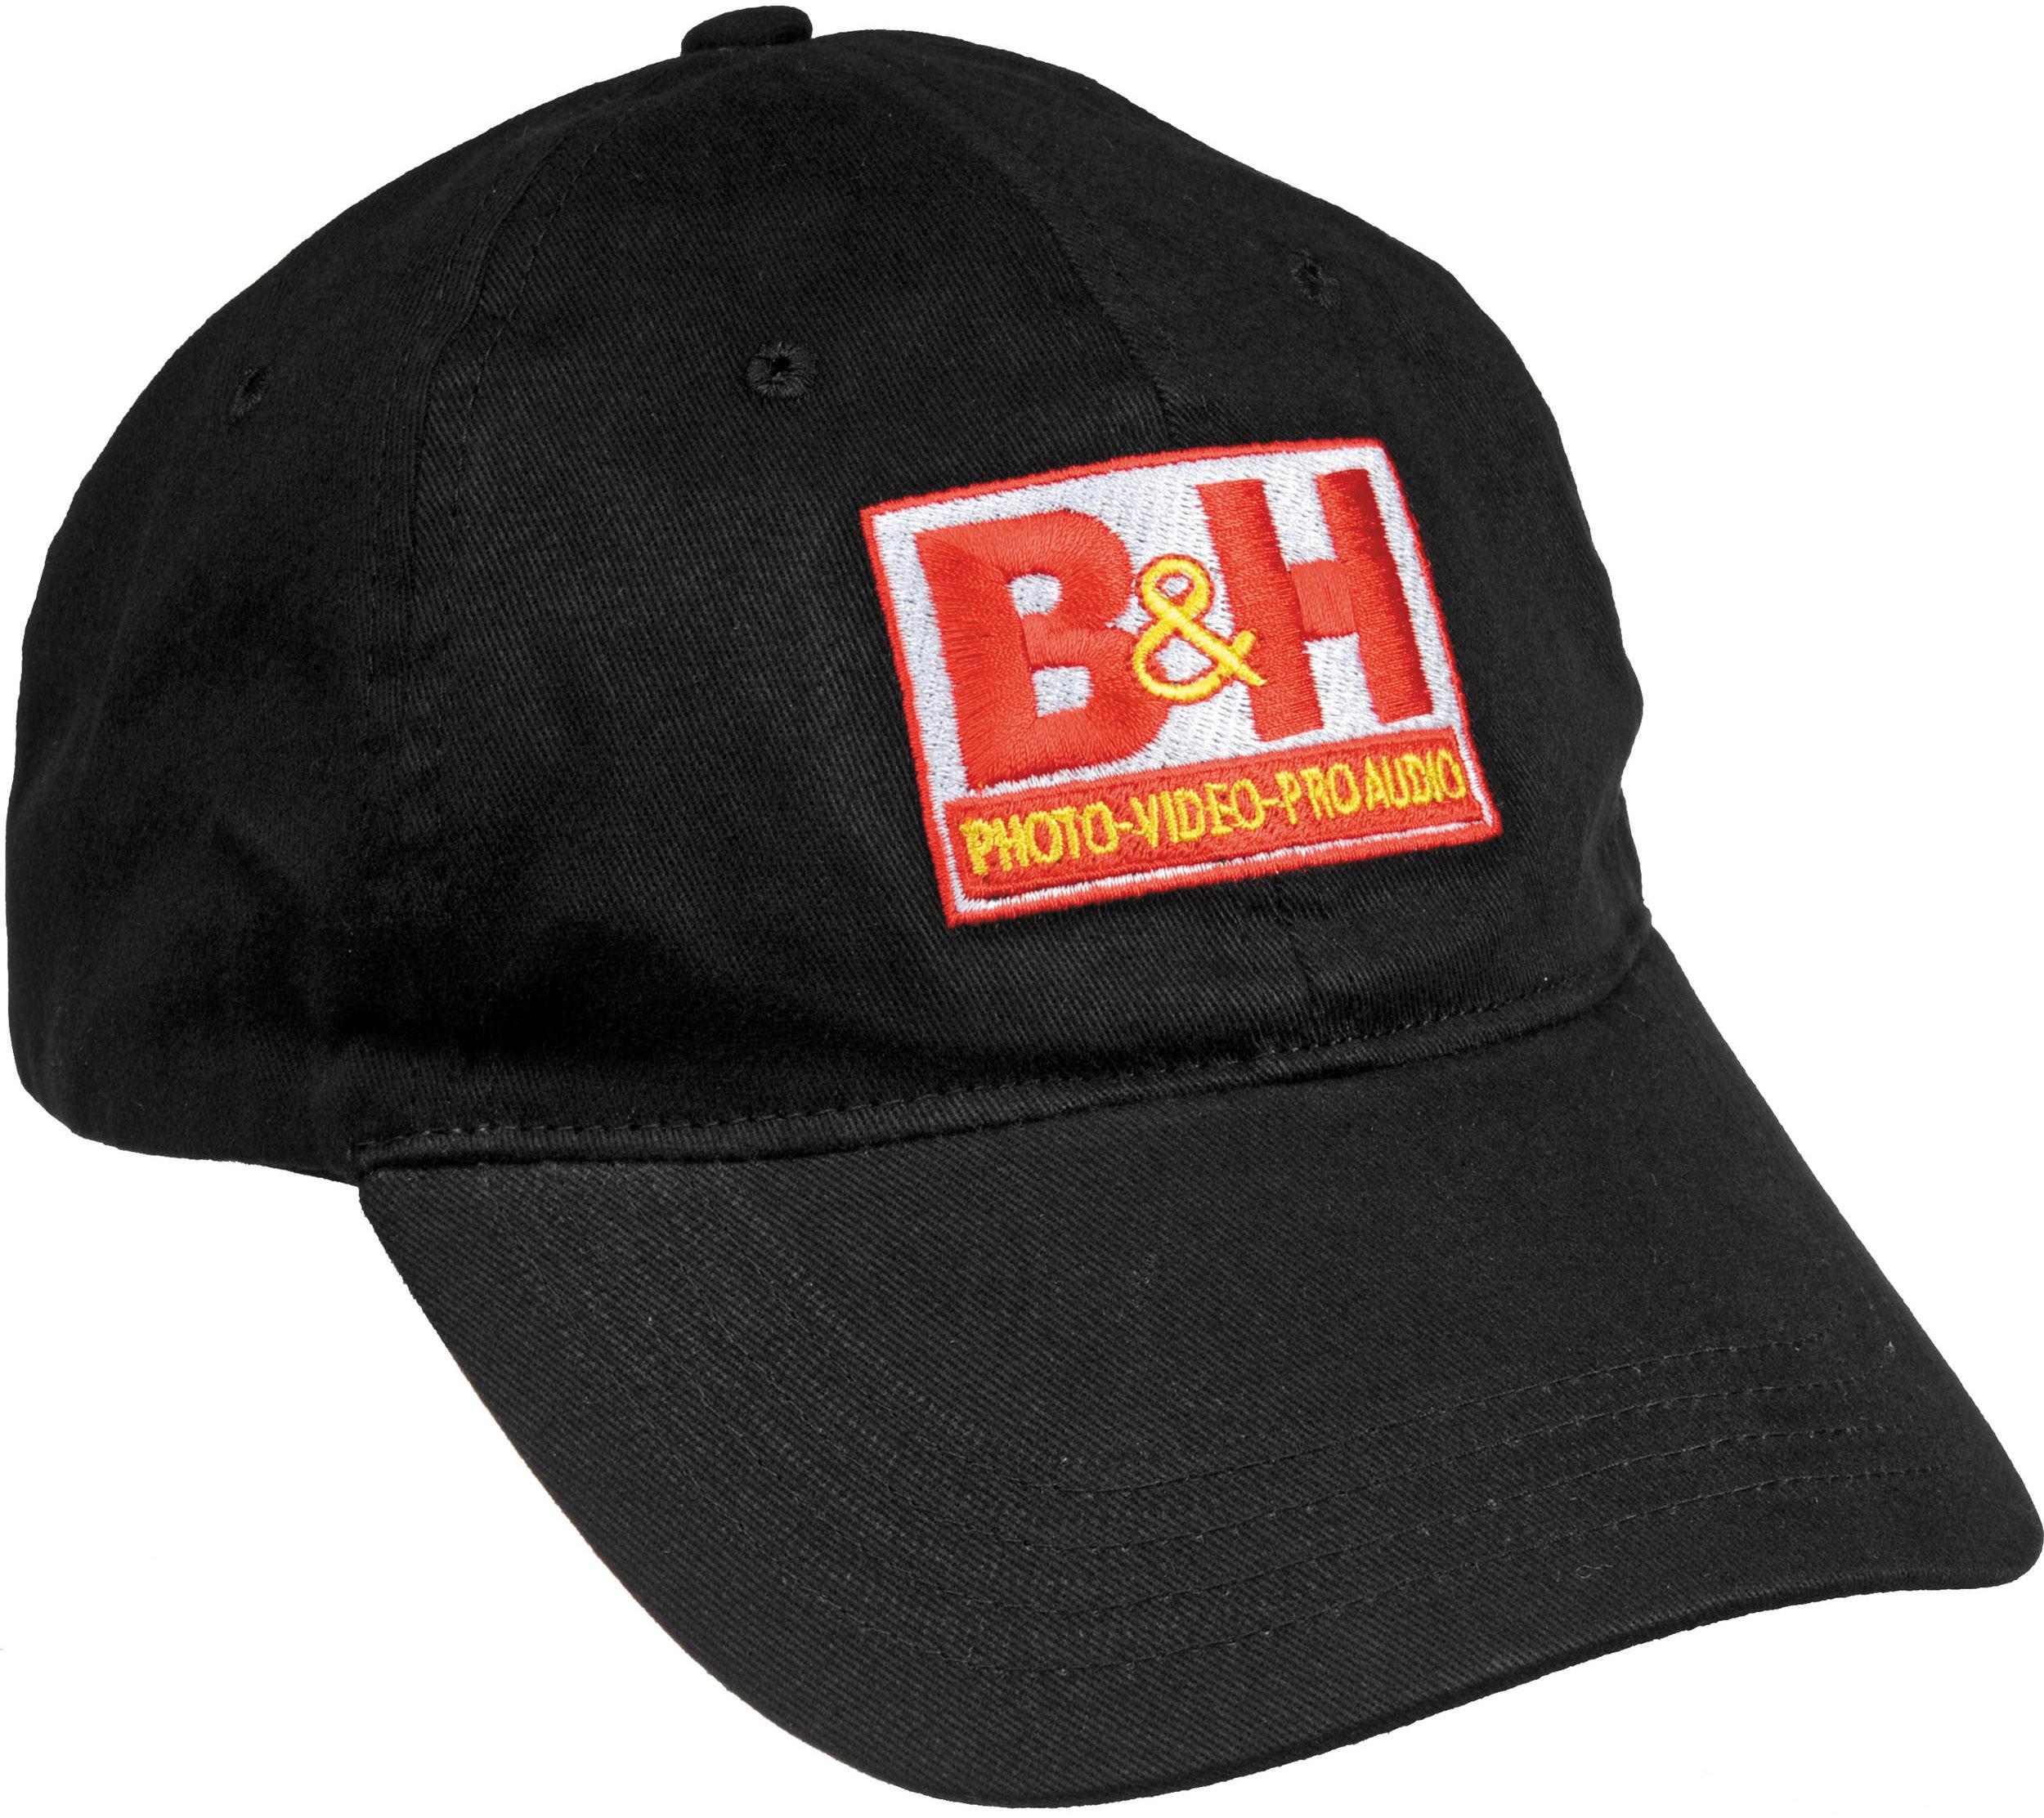 B&H Photo Video Logo Baseball Cap